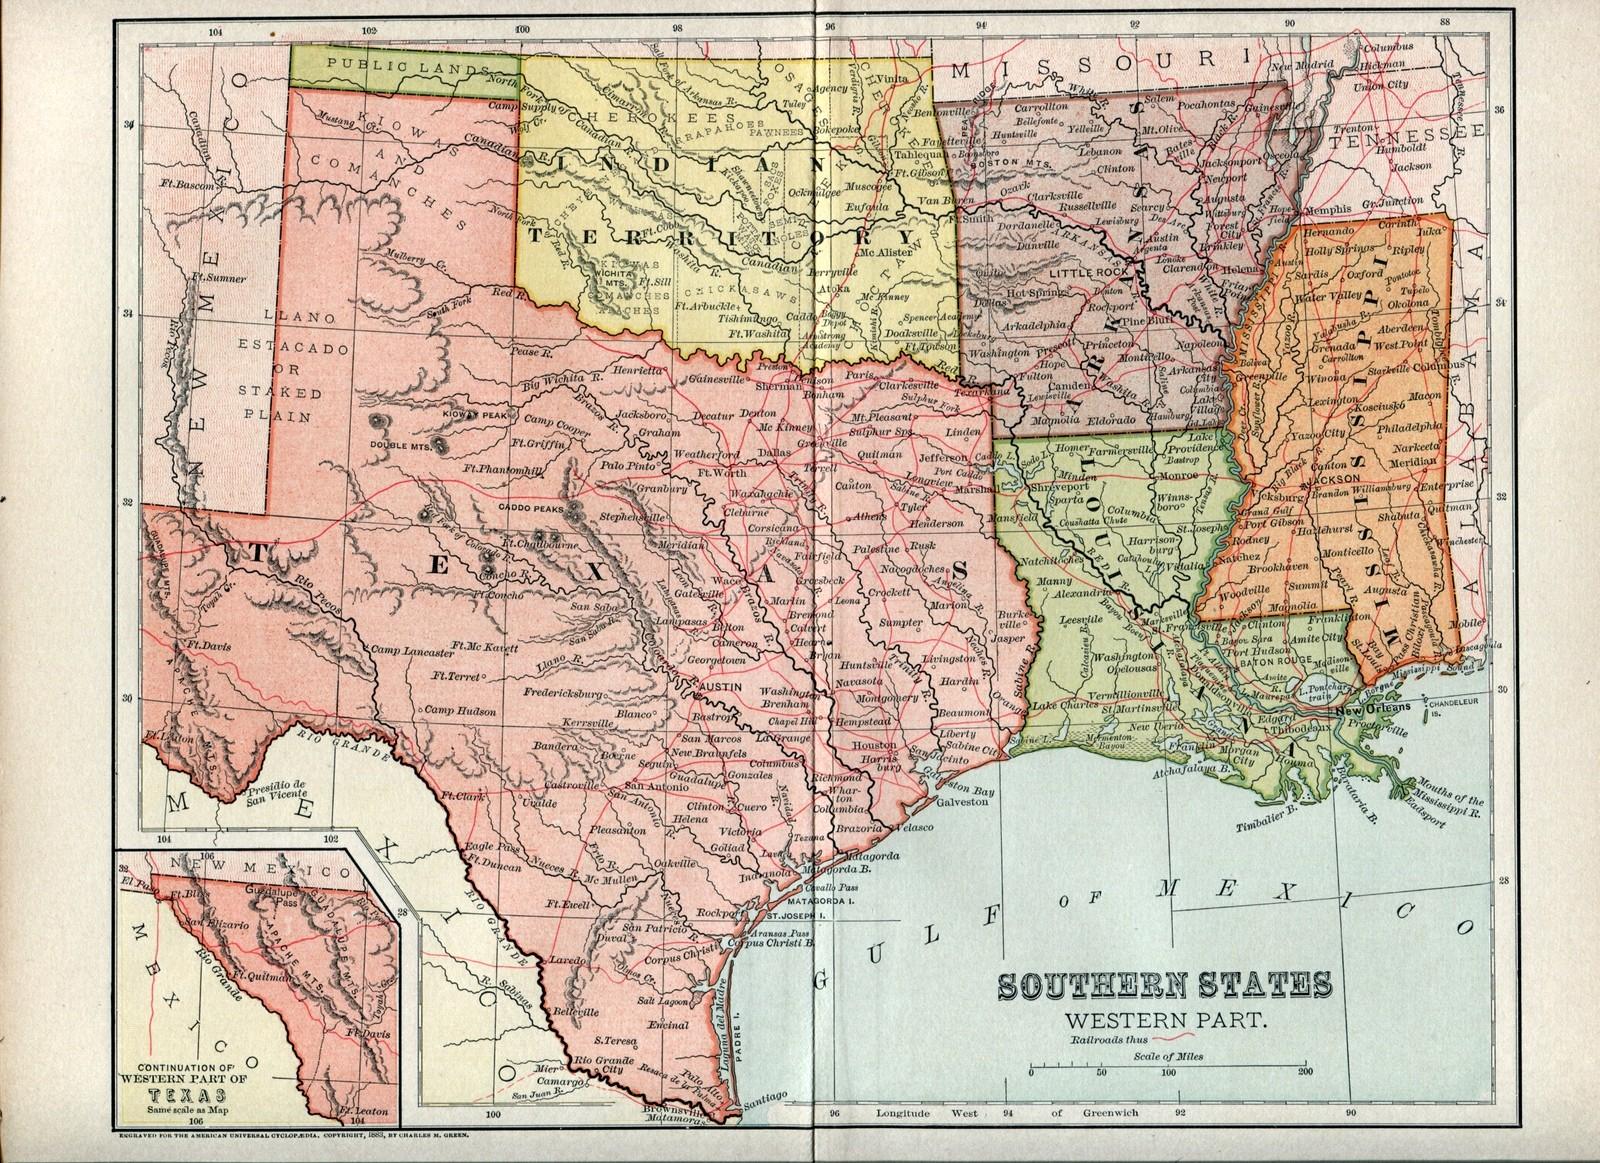 Ic87 020A 19 Maps Of Texas And Louisiana | Settoplinux - Texas Louisiana Border Map